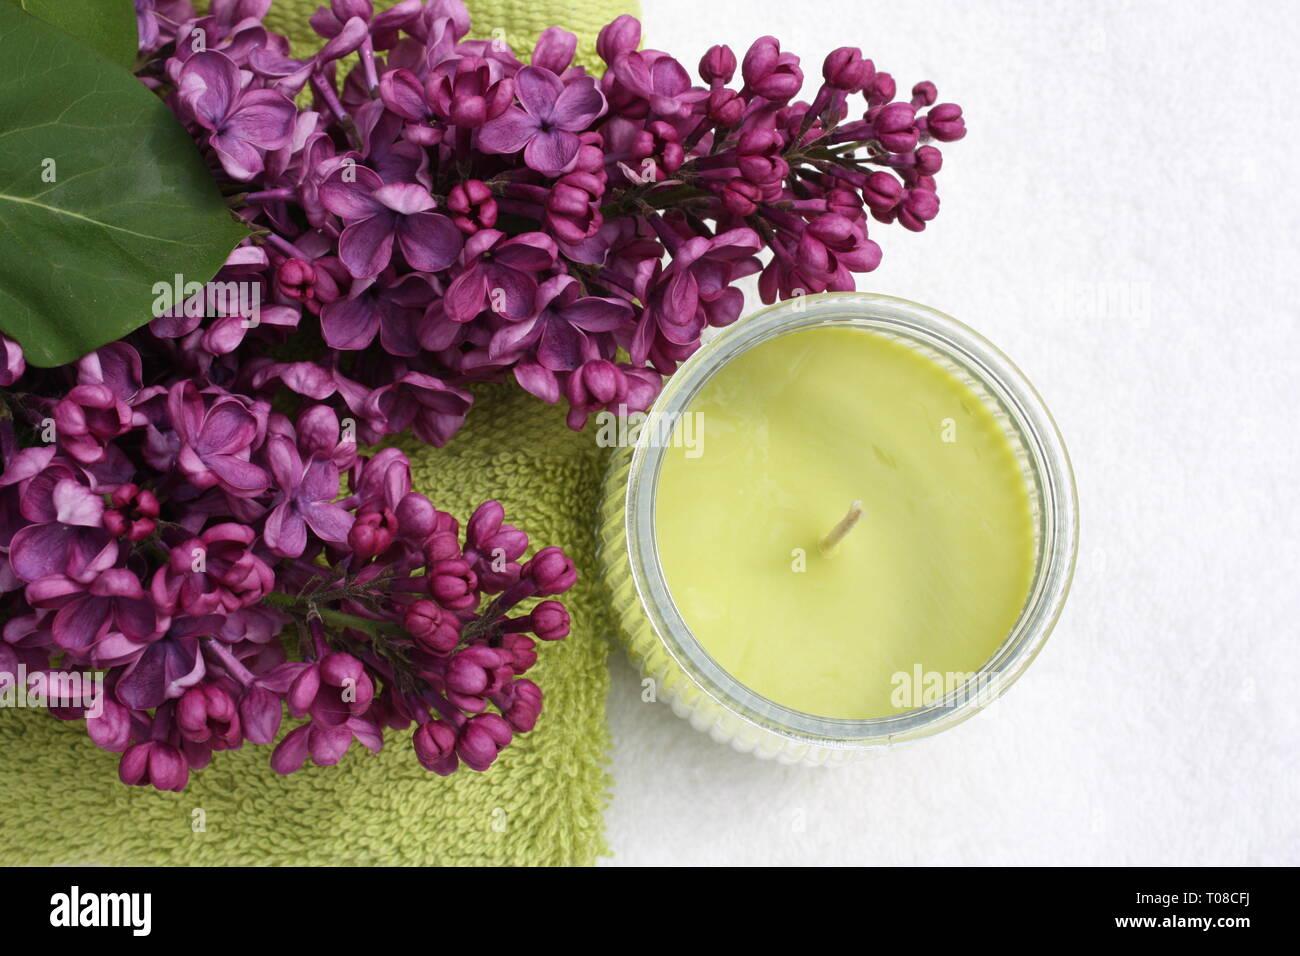 Purple syringa flowers with candles Stock Photo